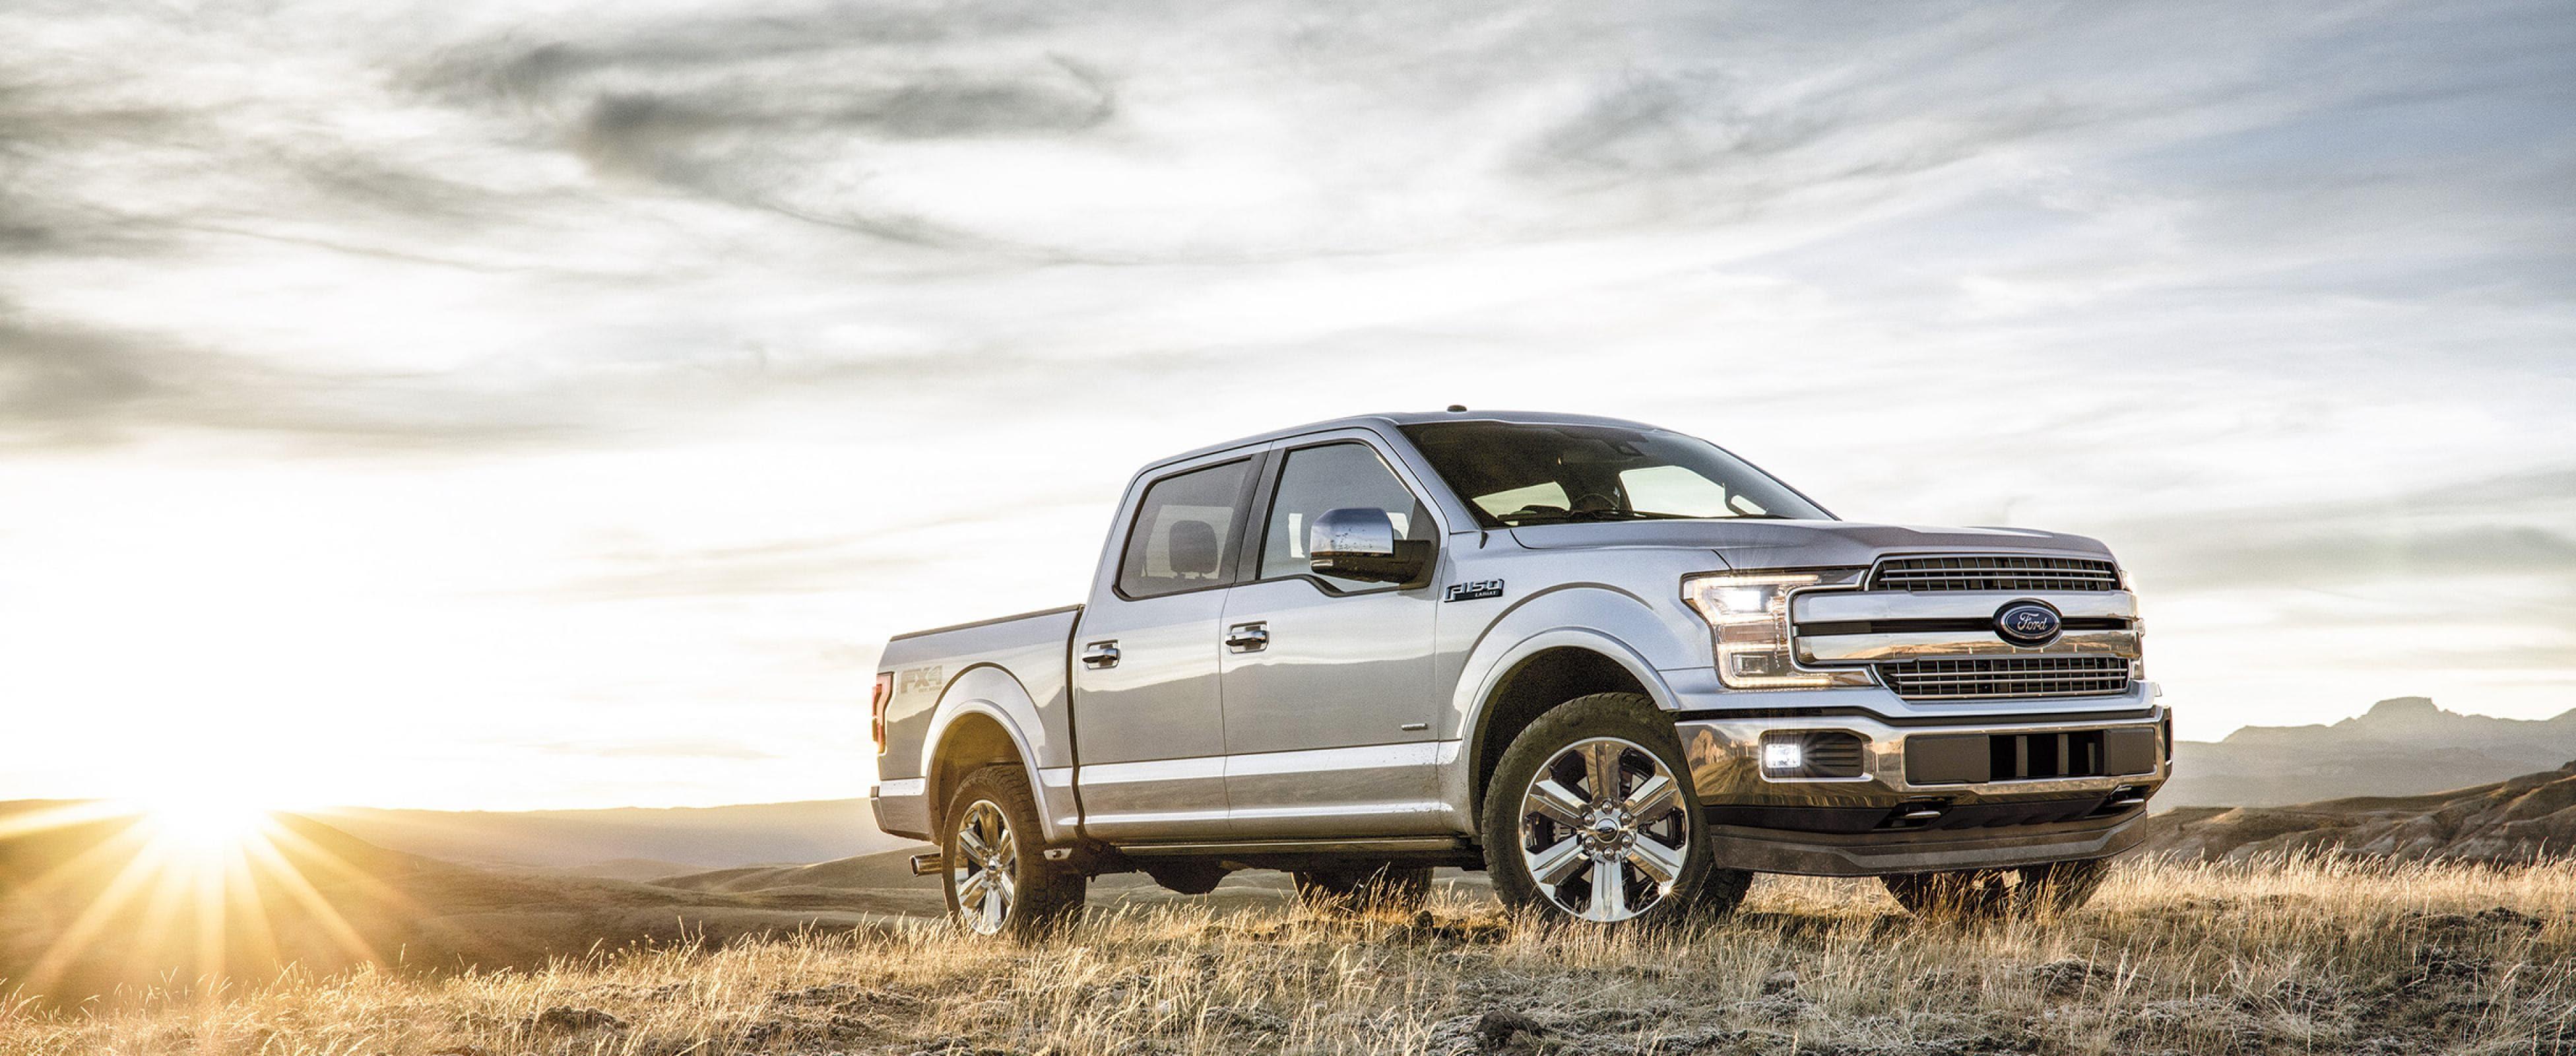 Full Size Pickup Truck Rental Ford F 150 Or Similar